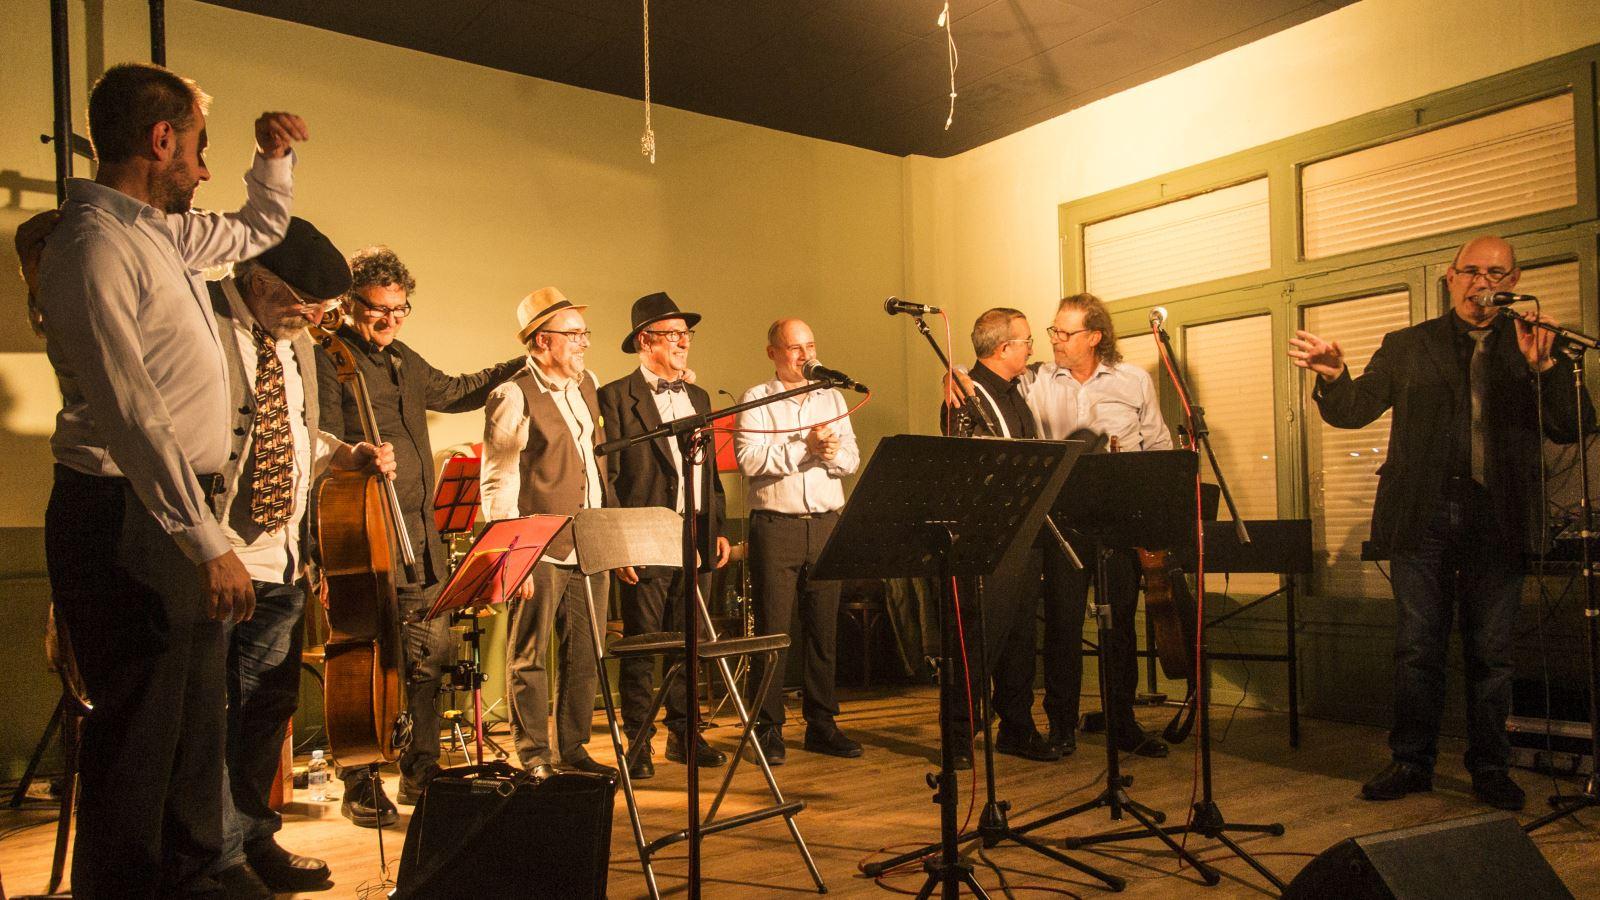 Actuacio conjunta del grup Boira amb Piccola Band a Mollerussa